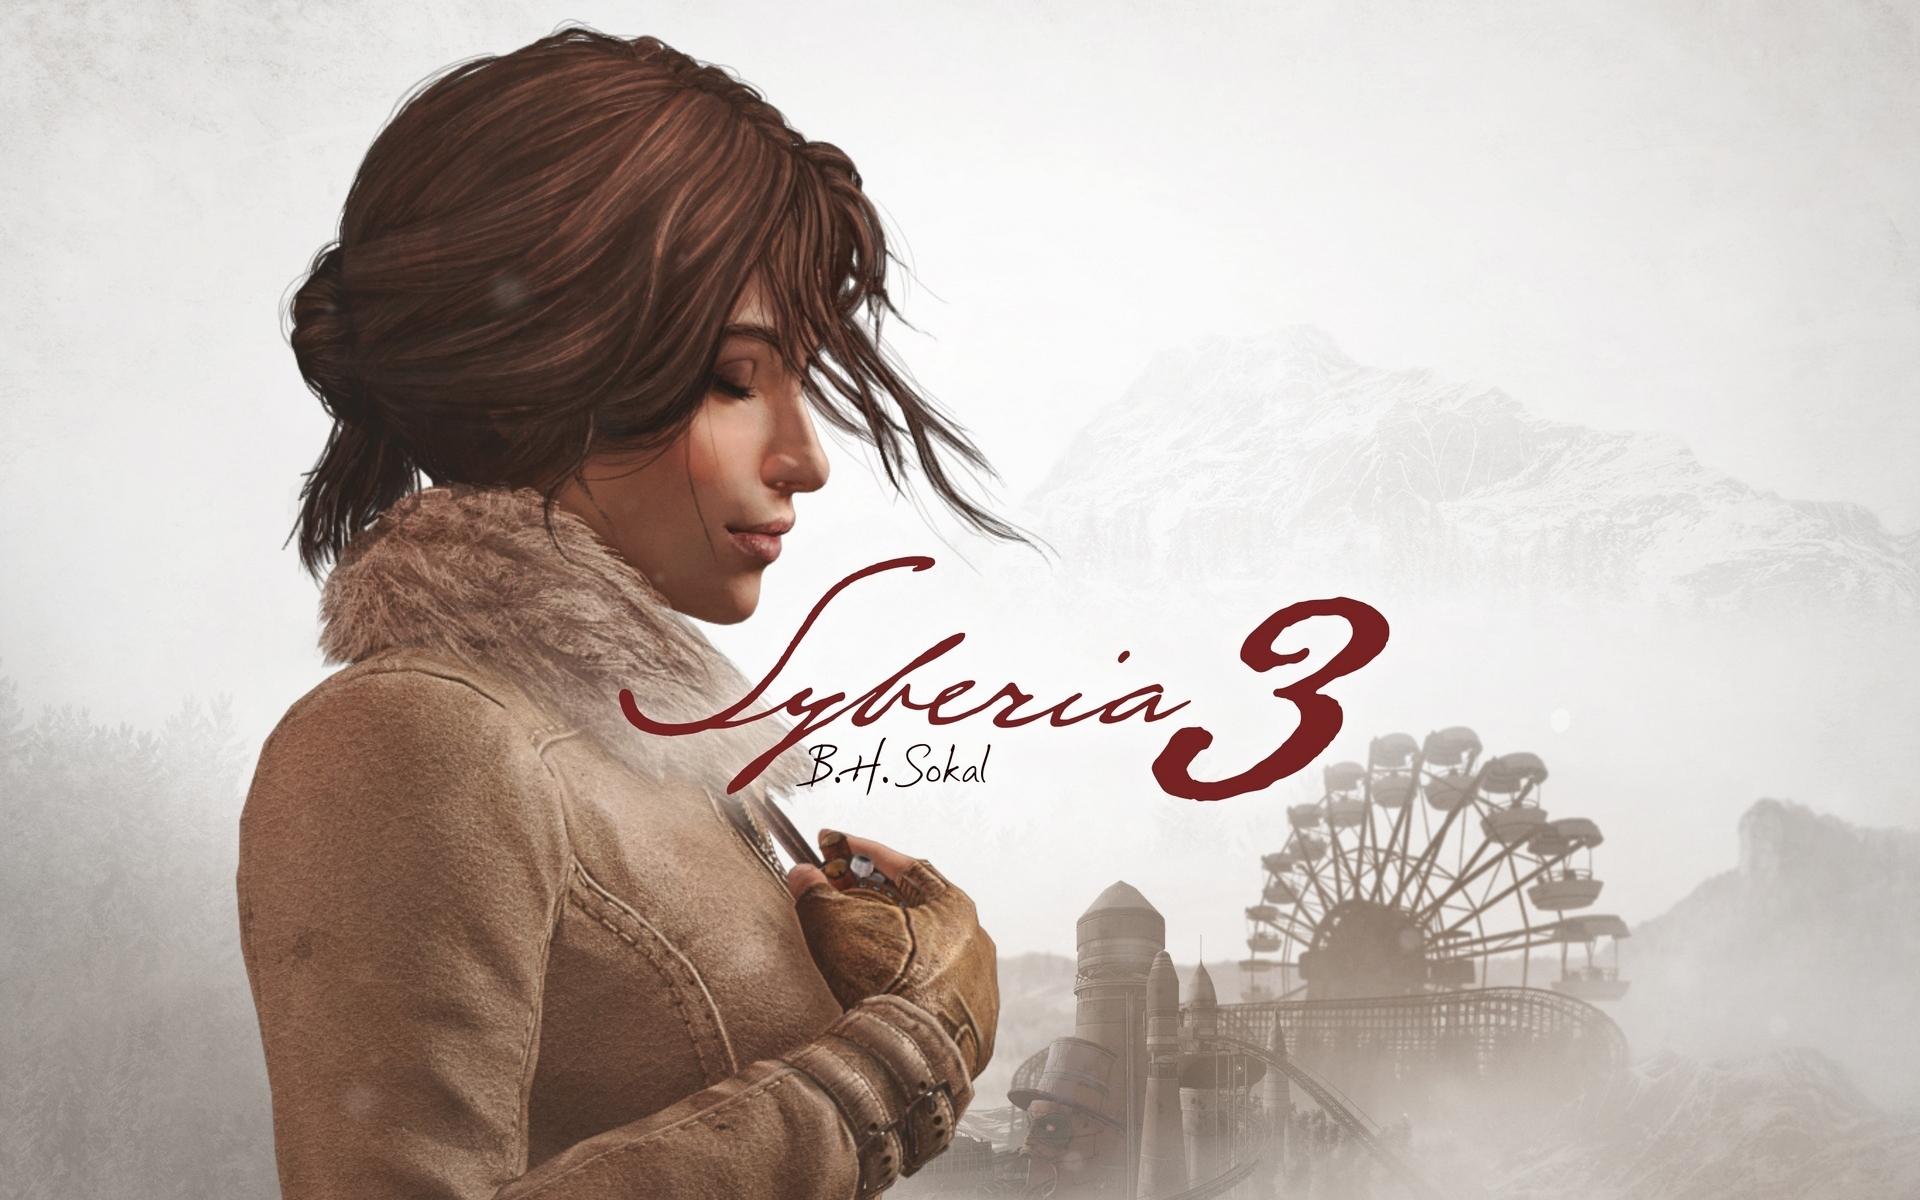 syberia-3-download-xgamex